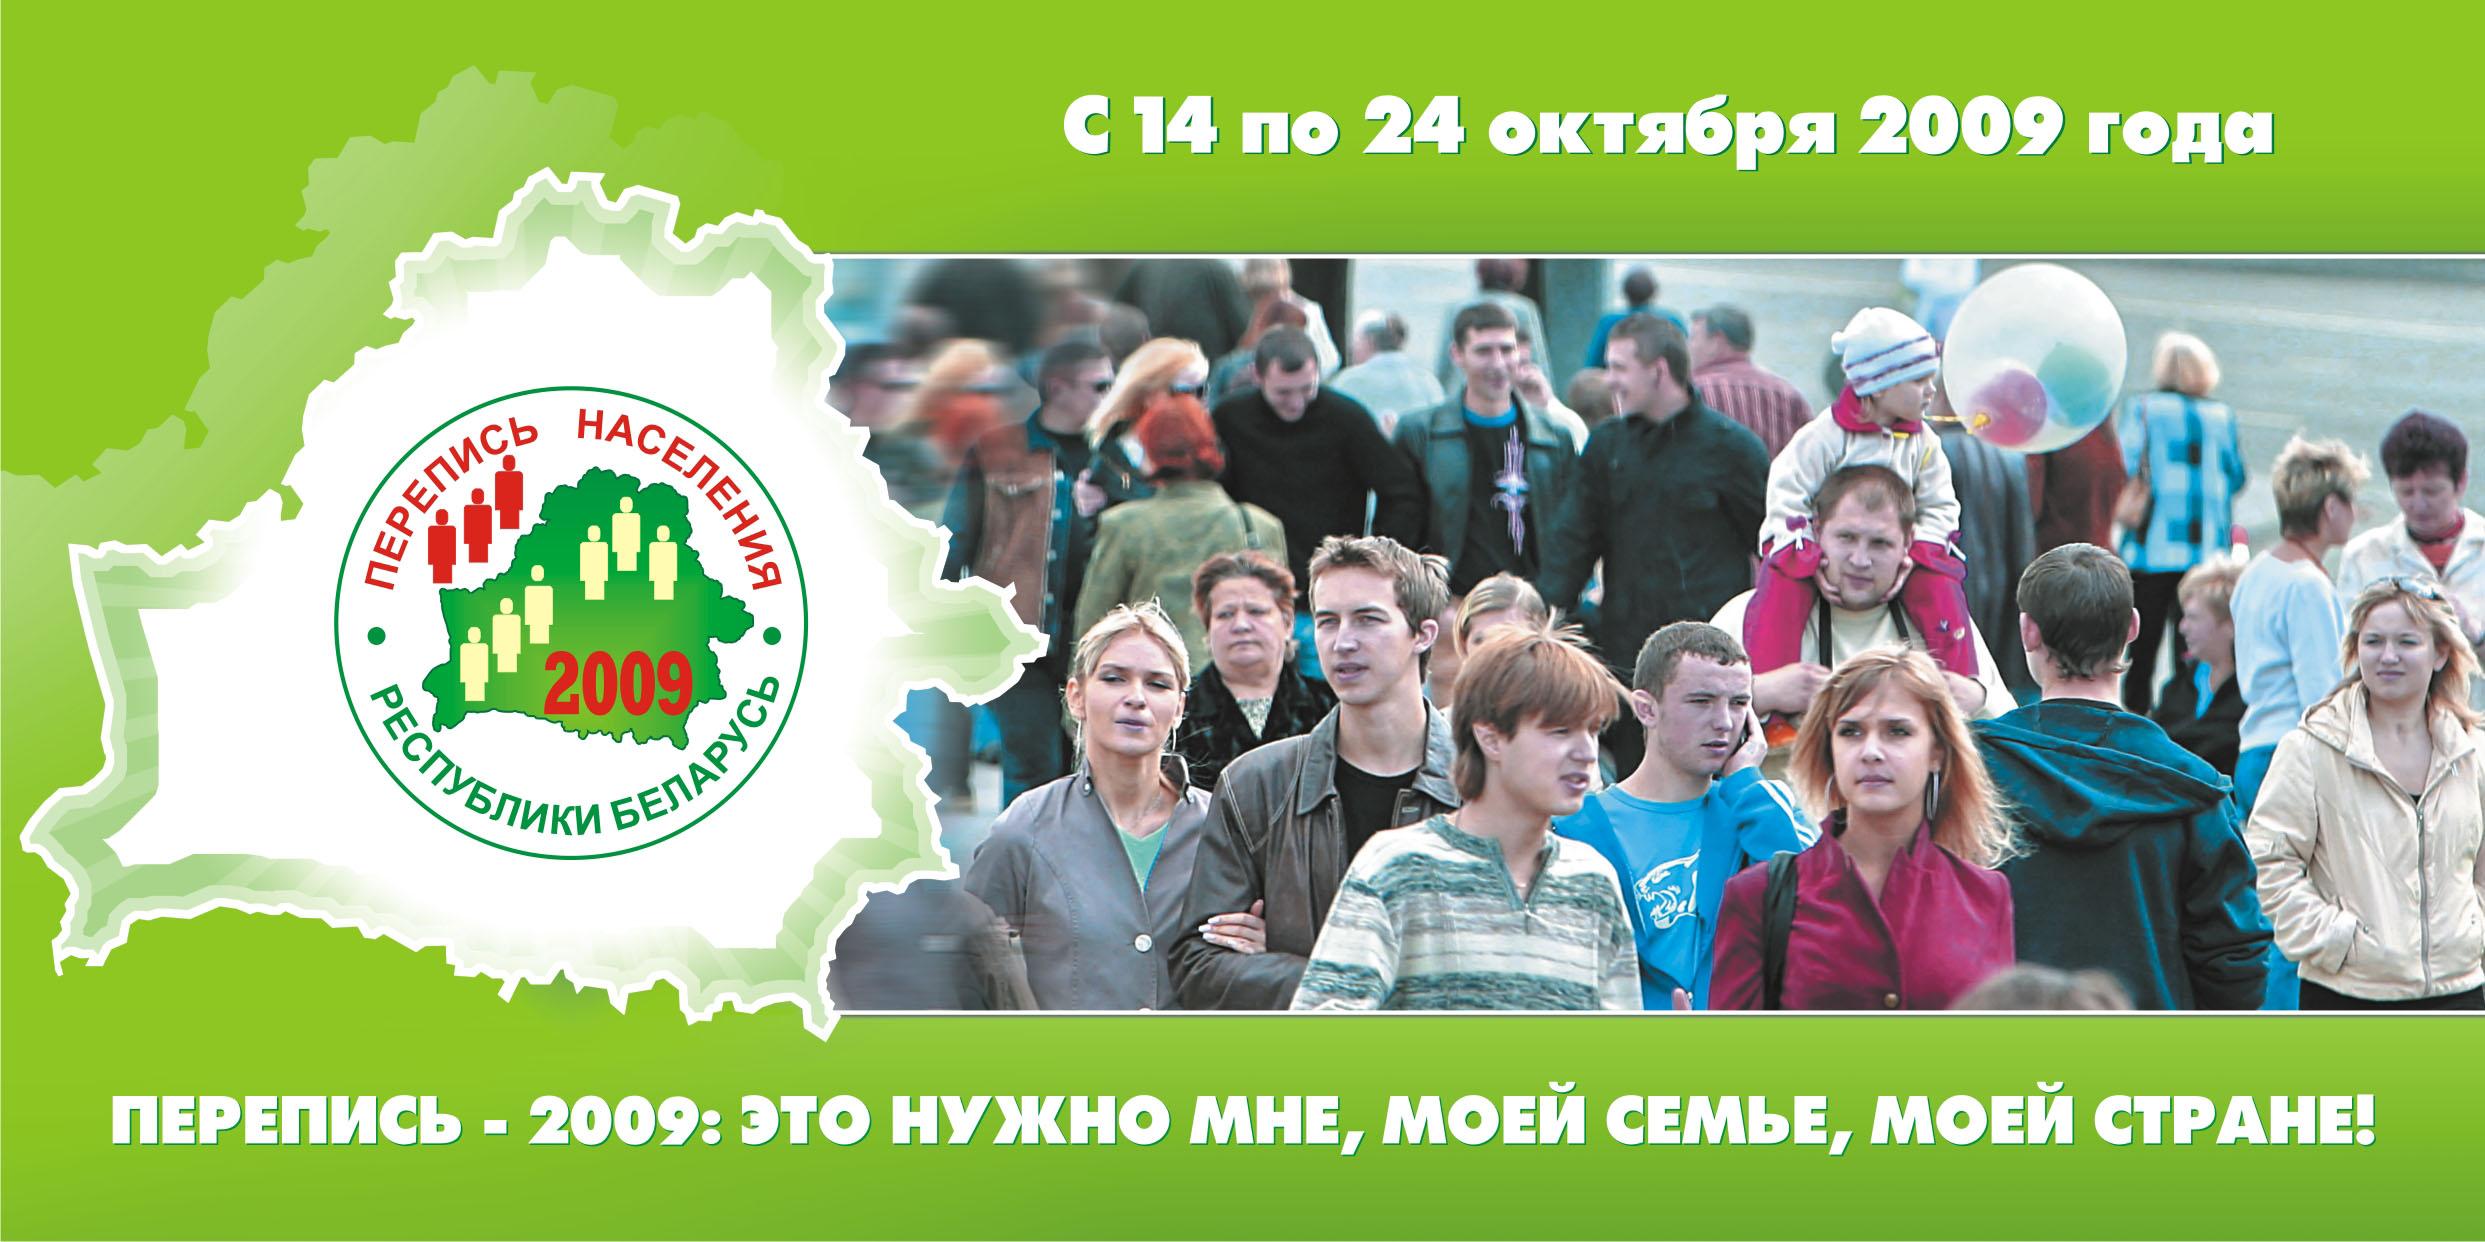 Russian B D Population Census 36